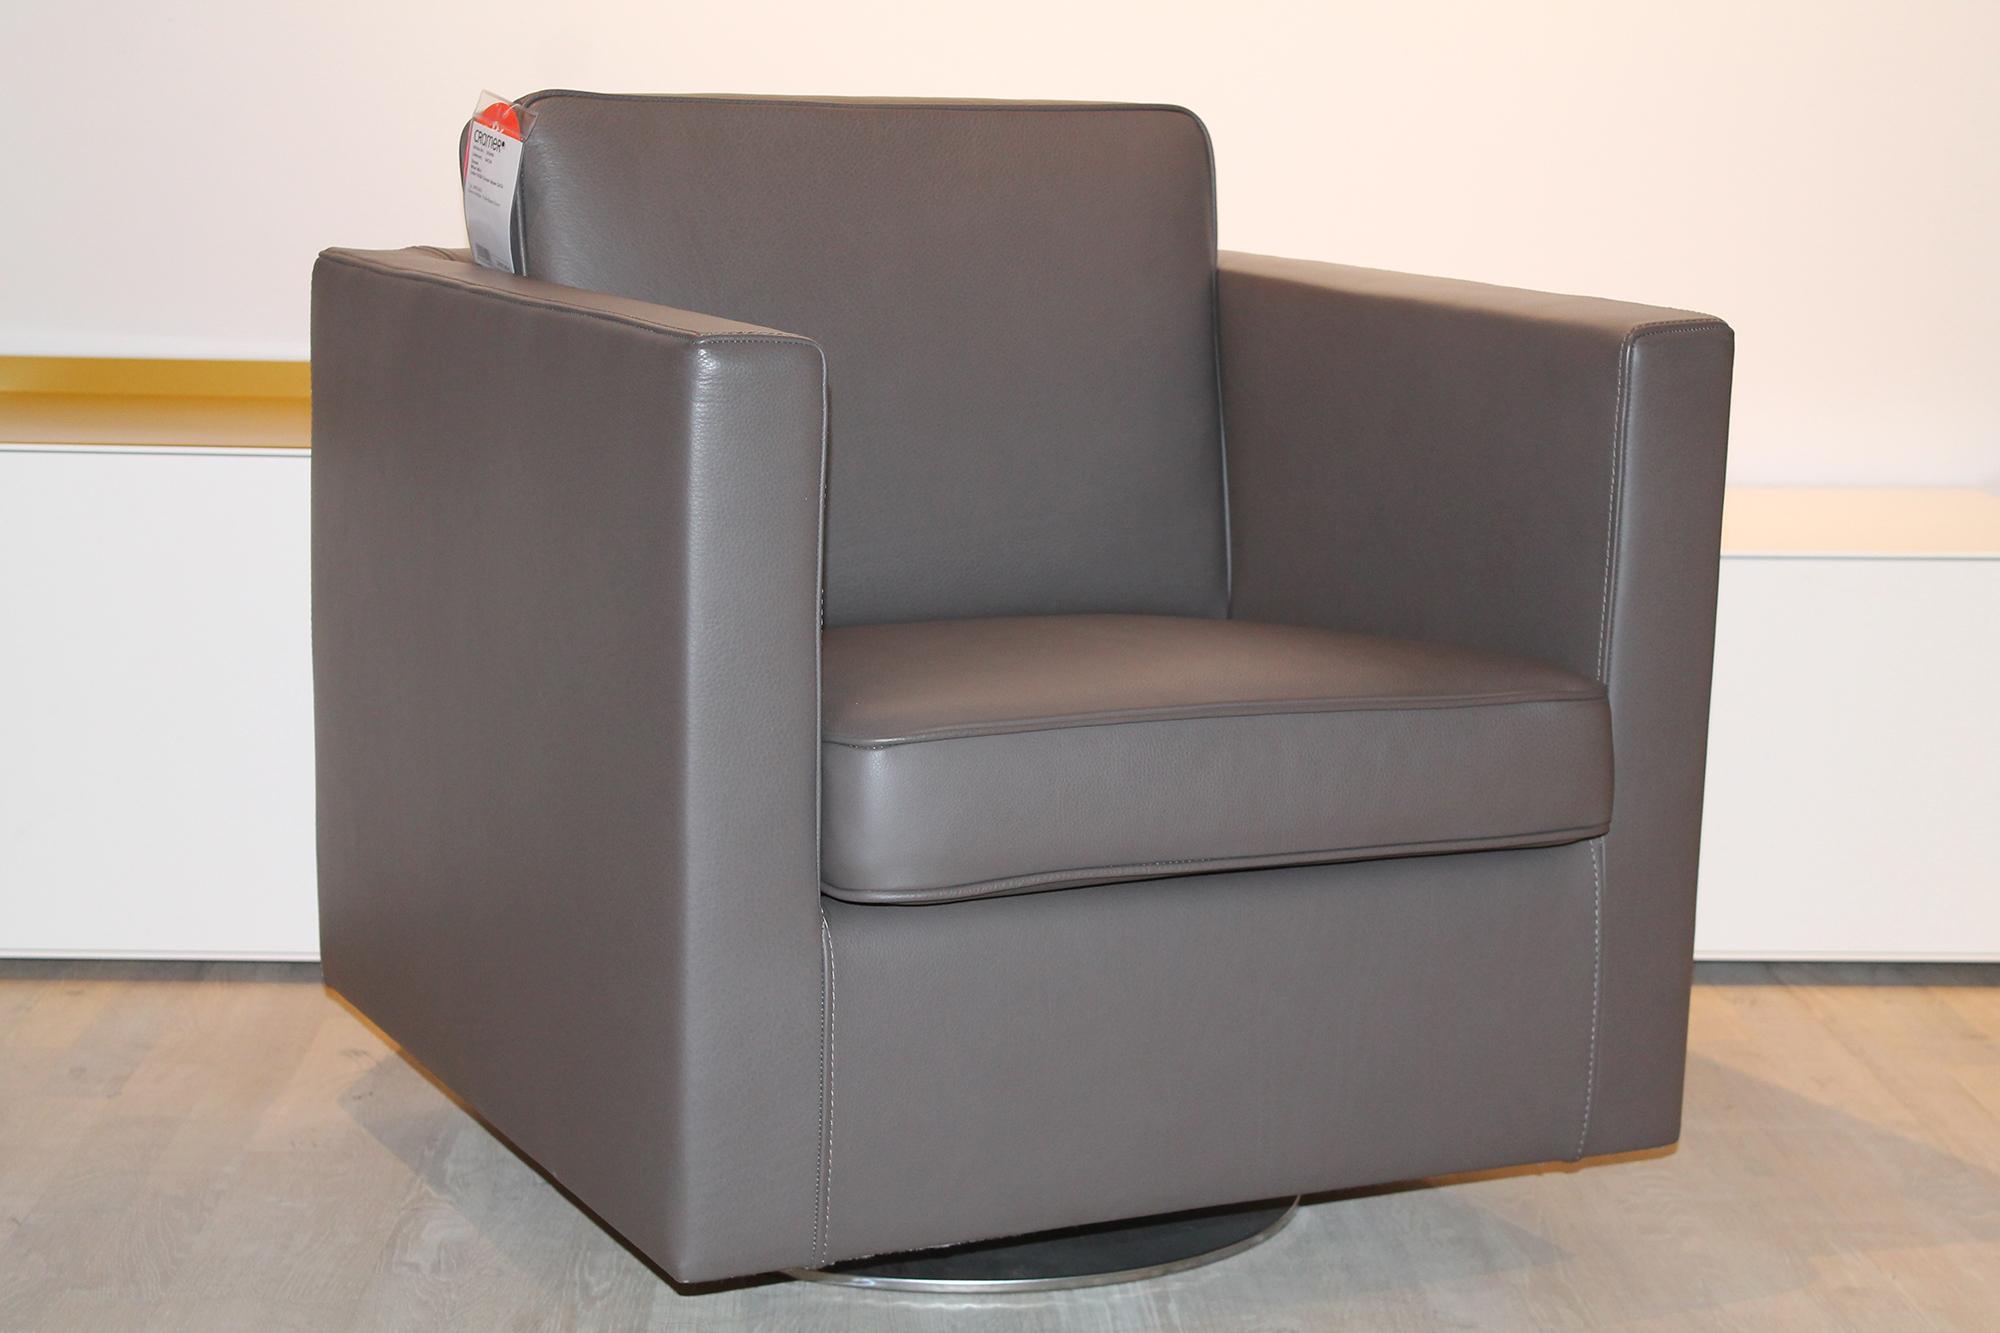 mini sessel affordable loft design retr kis fotel sessel retro little armchair mini ipari. Black Bedroom Furniture Sets. Home Design Ideas